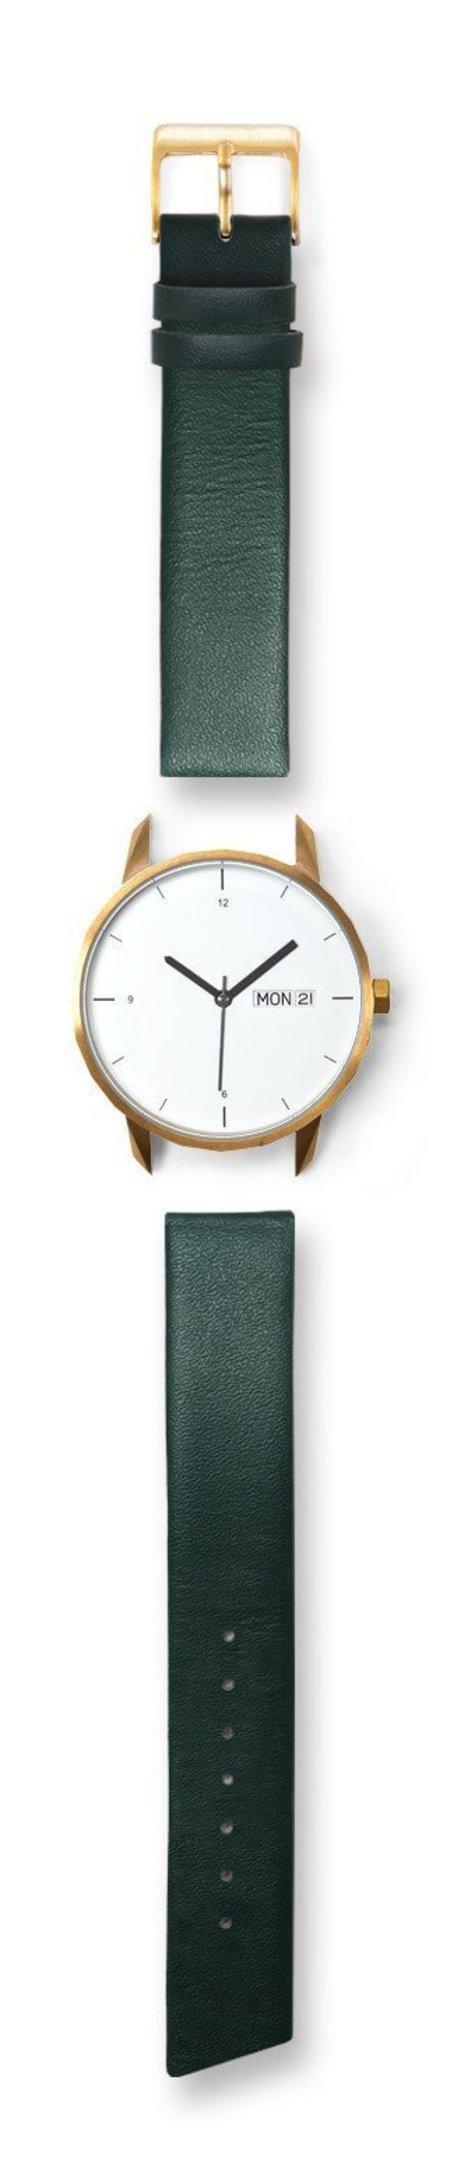 Unisex Tinker Watches Standard Strap Watch - Gold/Green